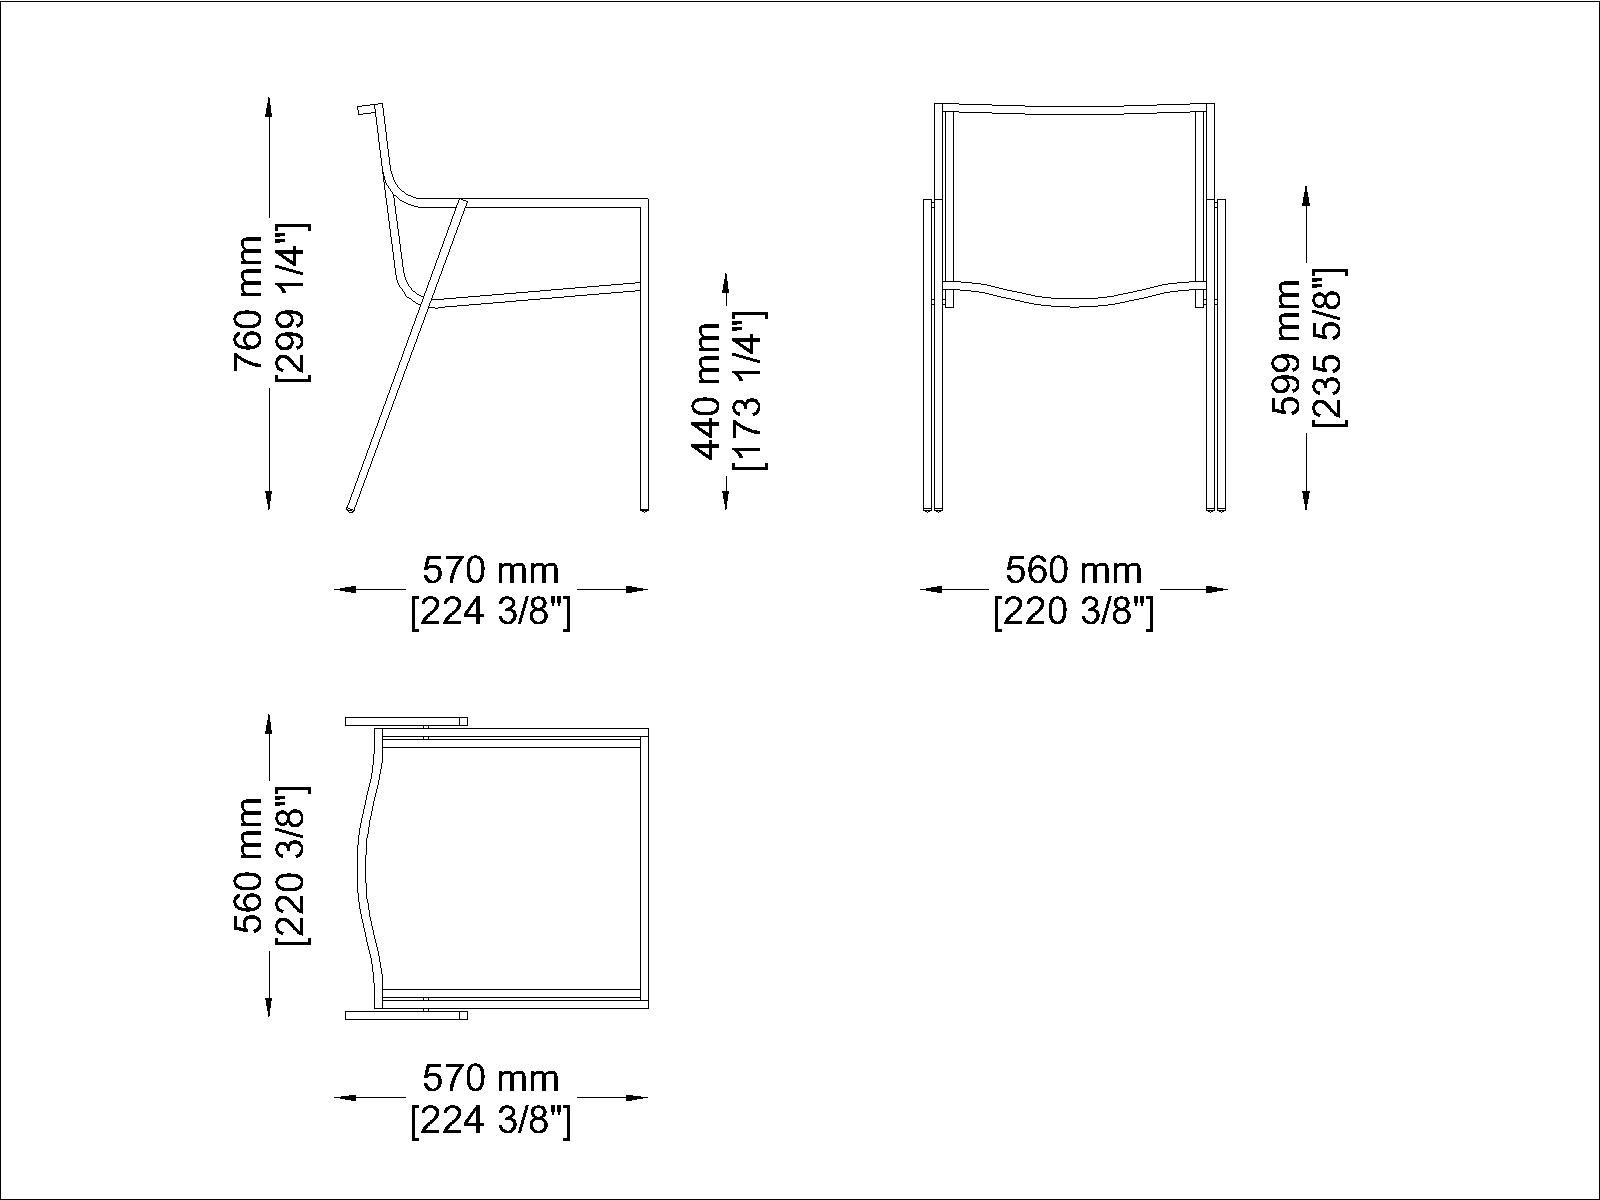 Coro SG1 SB Stuhl Polyurethan-Lamellen Rahmen Edelstahl satiniert stapelbar